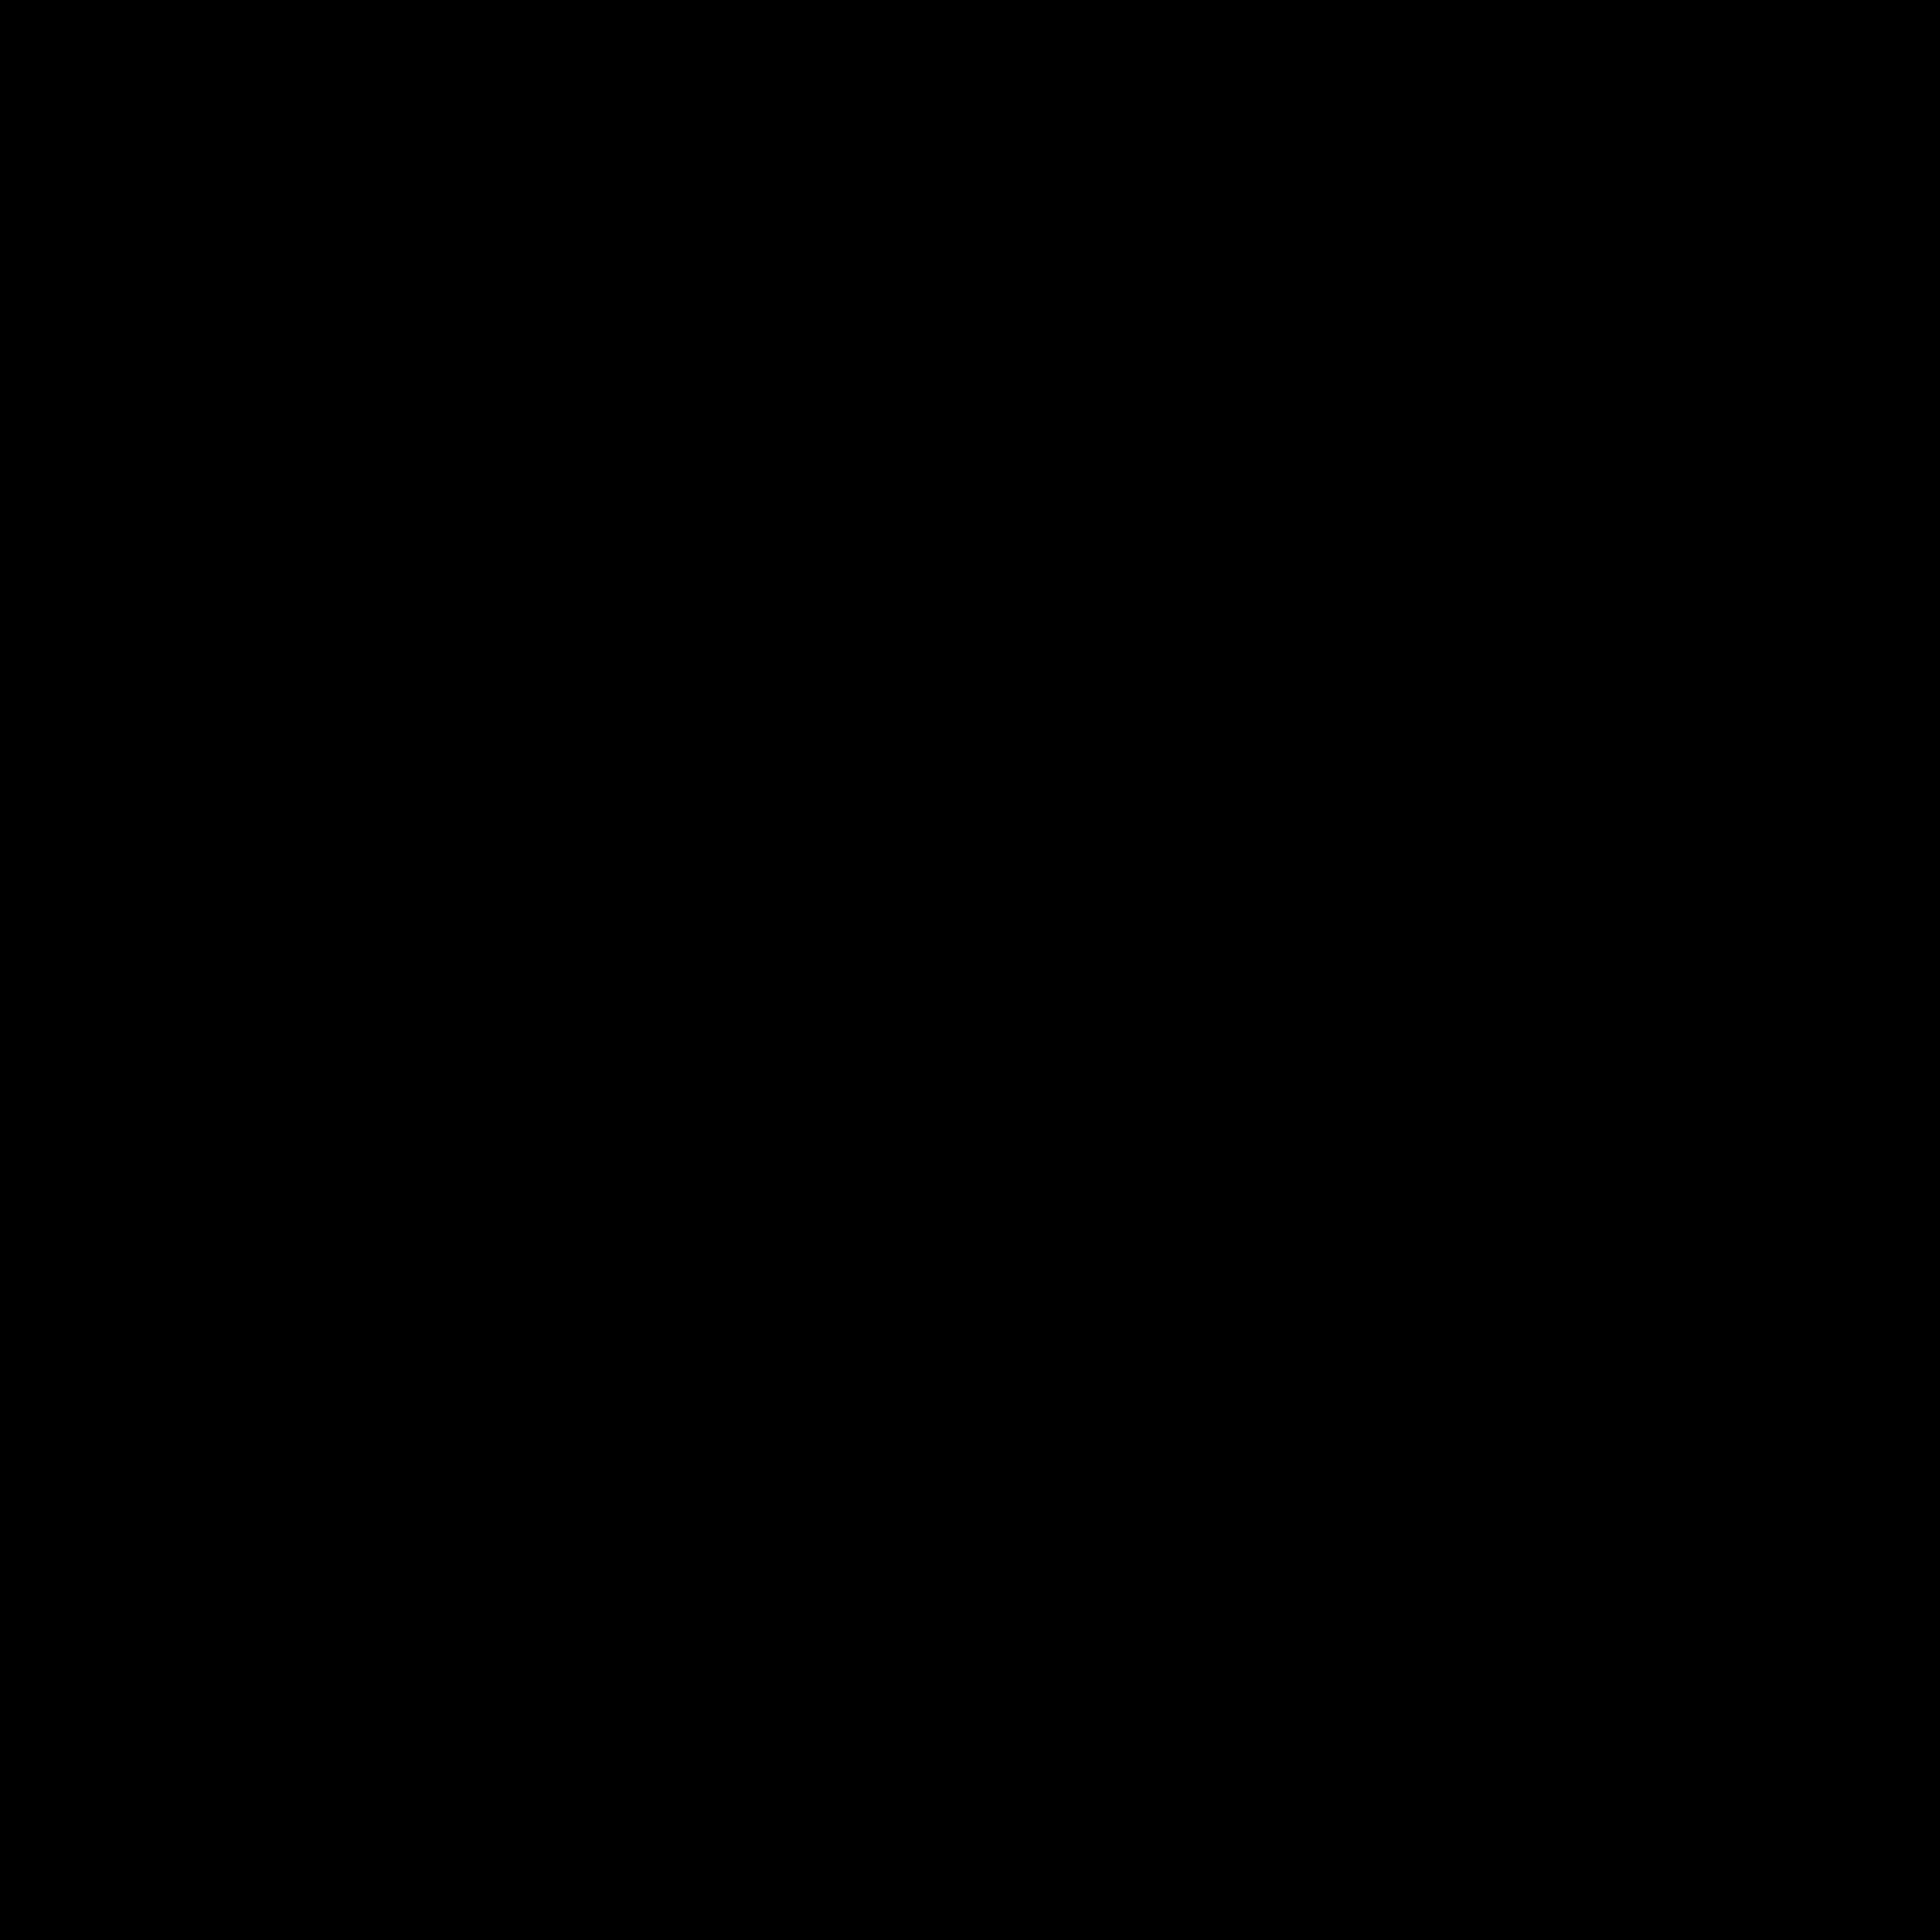 2000x2000 Silhouette